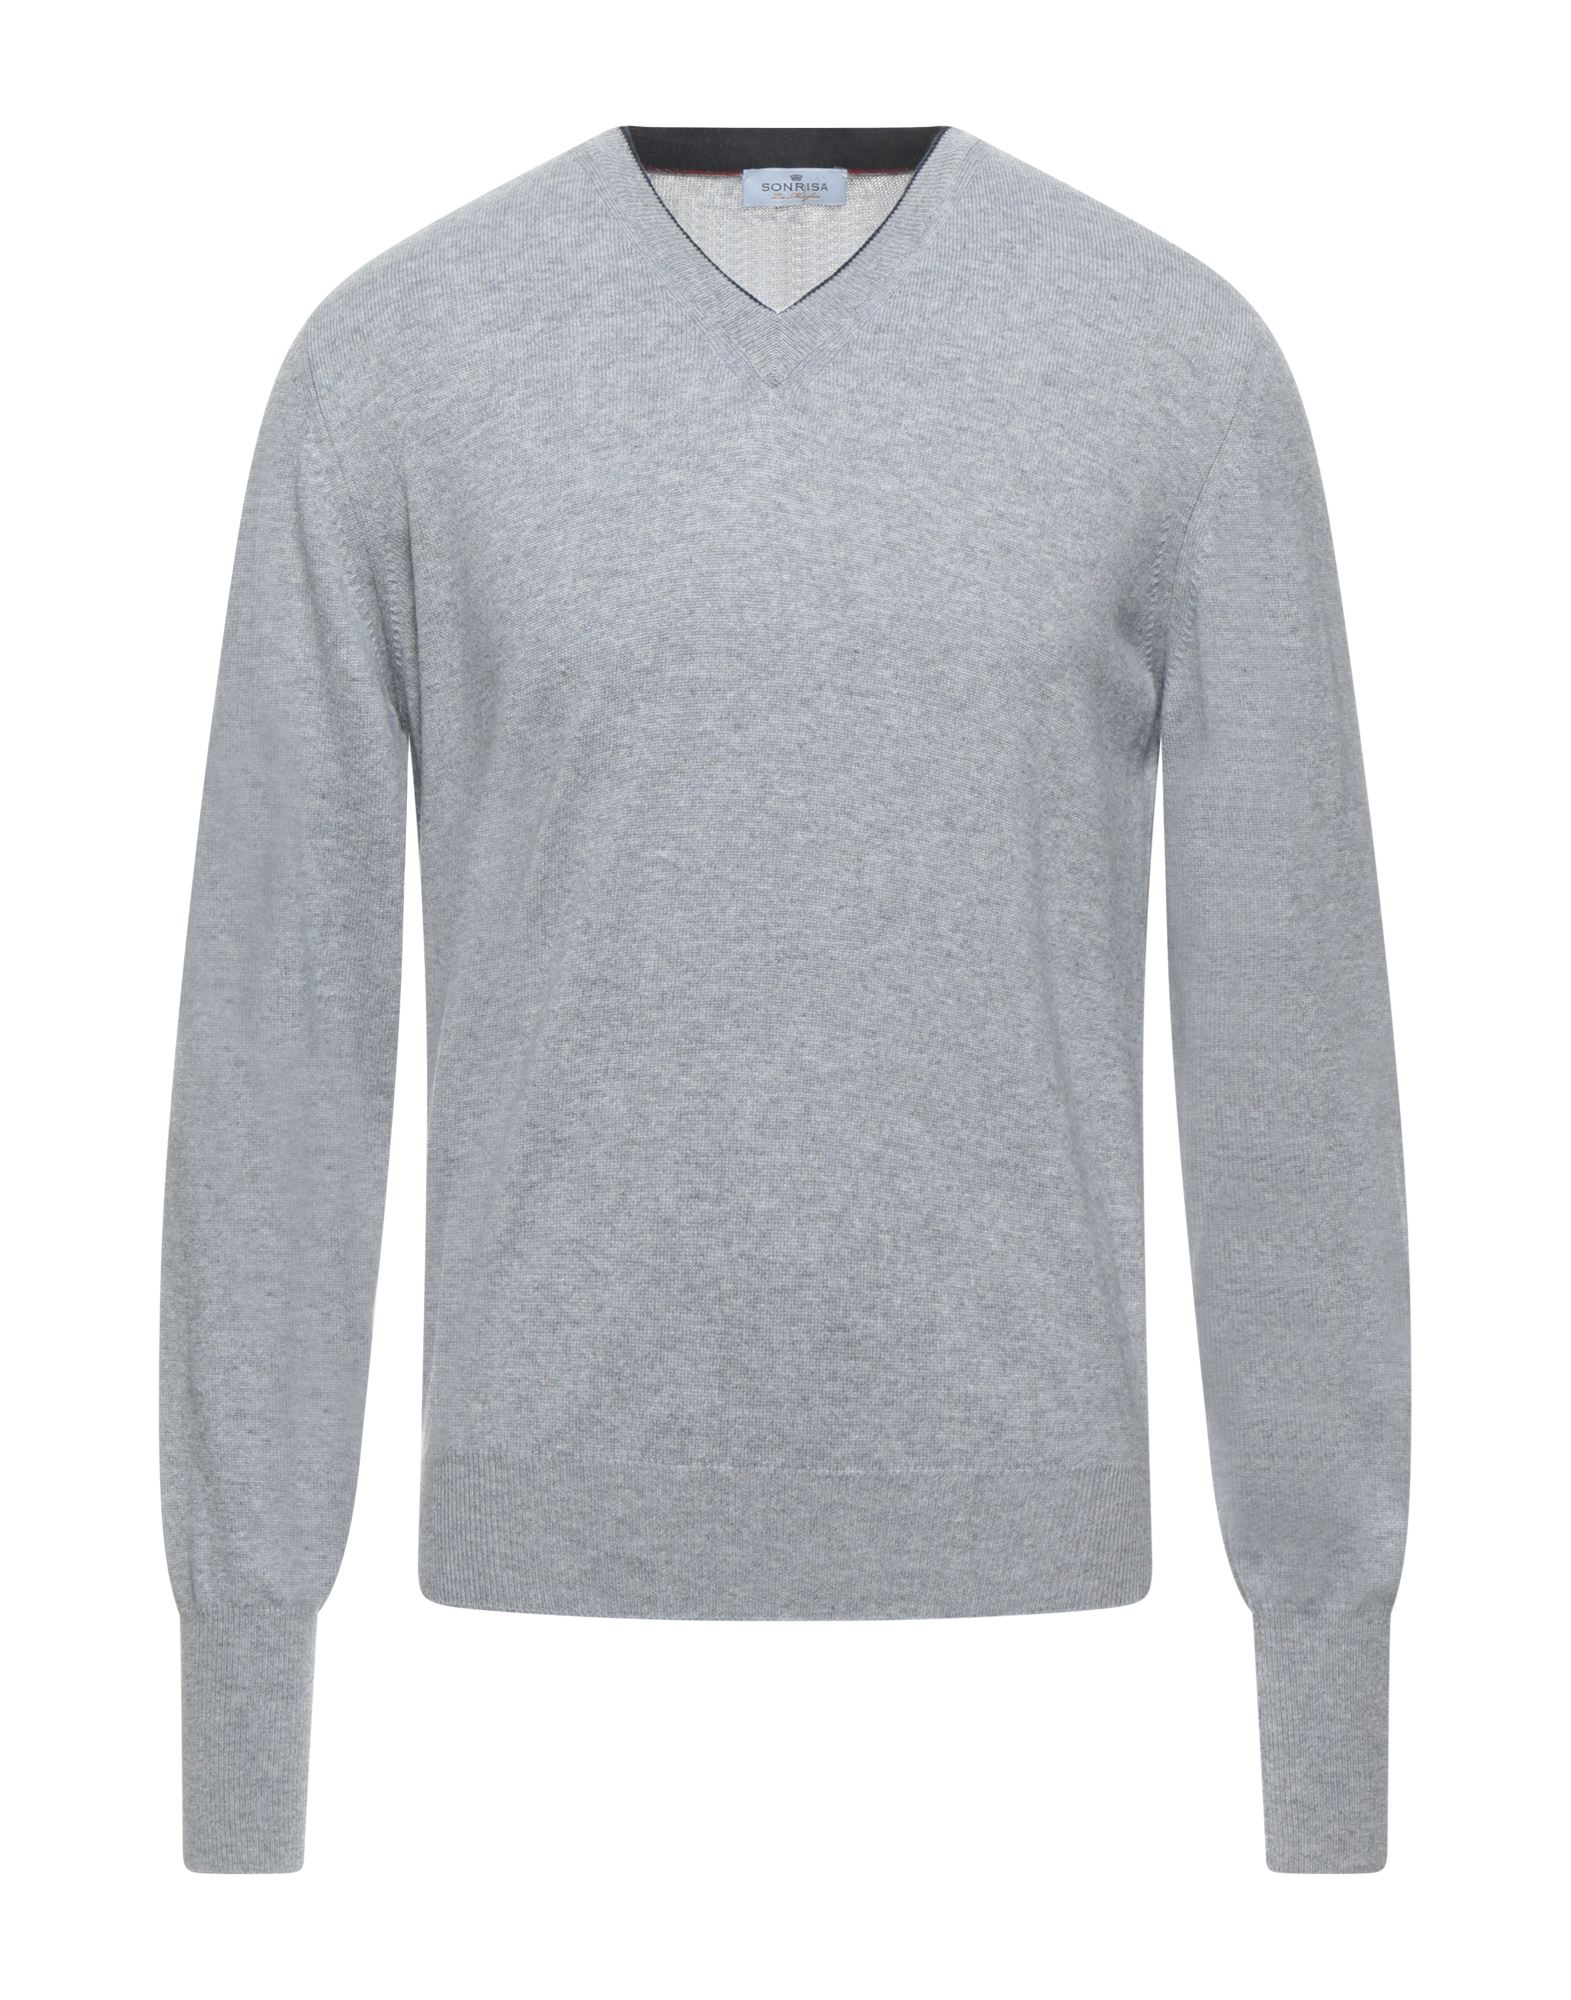 SONRISA Sweaters - Item 14066968